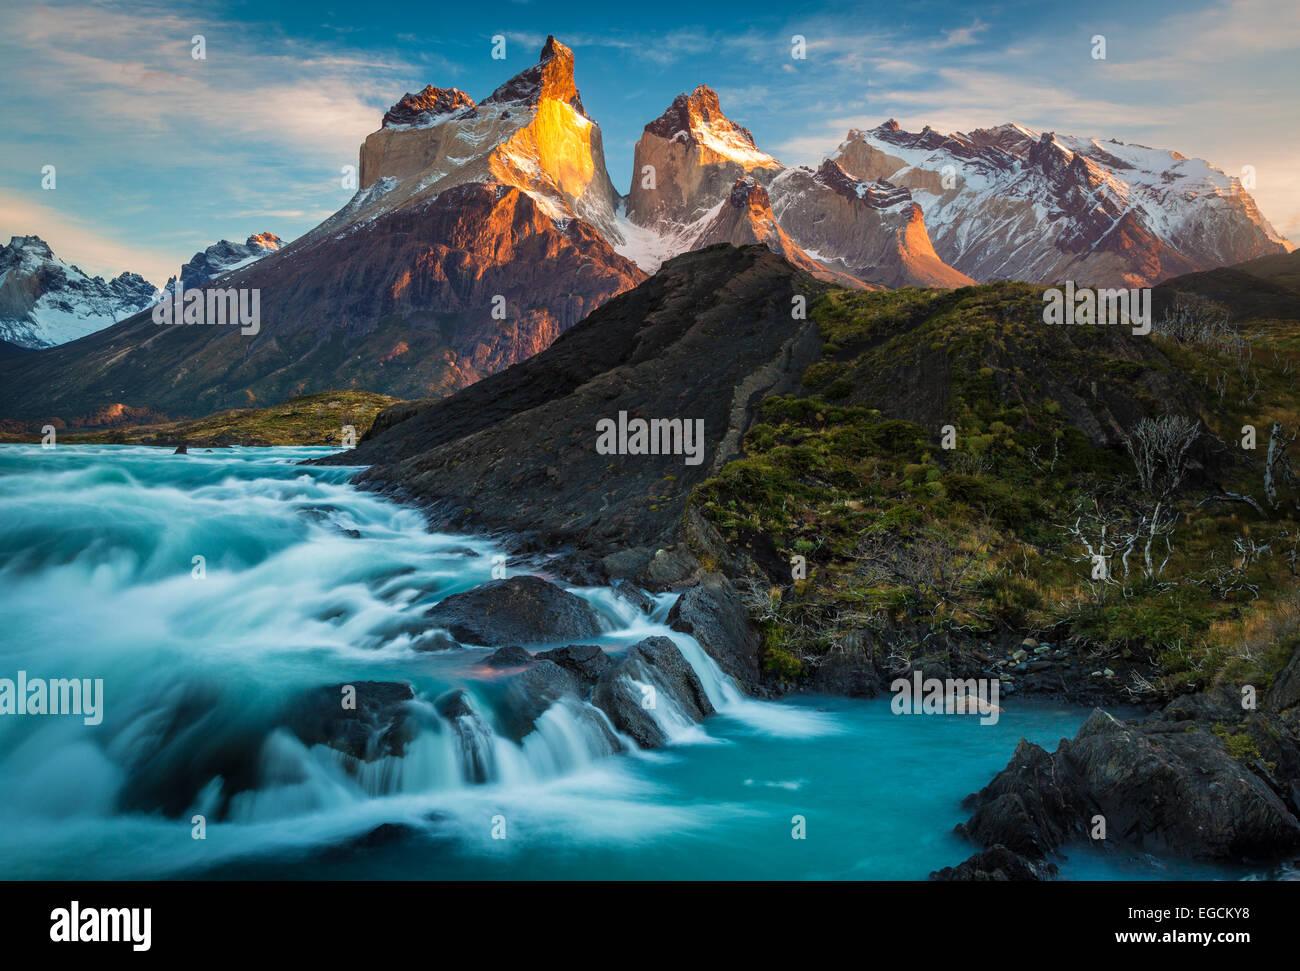 Los Cuernos towering above Salto Grande and Lago Nordenskjold, Torres del Paine, Chilean Patagonia - Stock Image